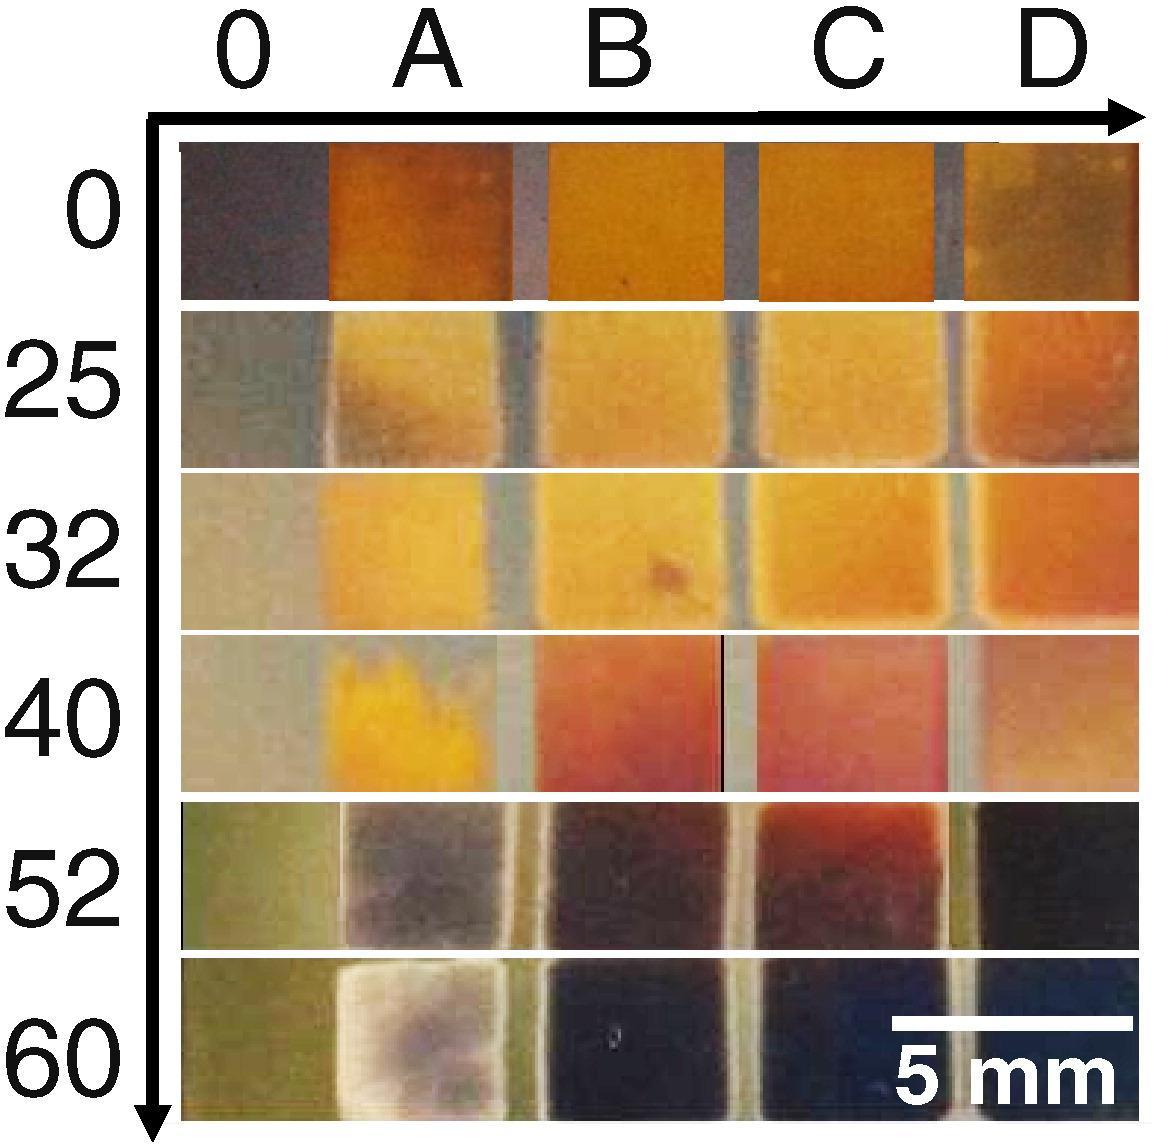 Tuning the plasmonic response of bimetallic films by laser irradiation